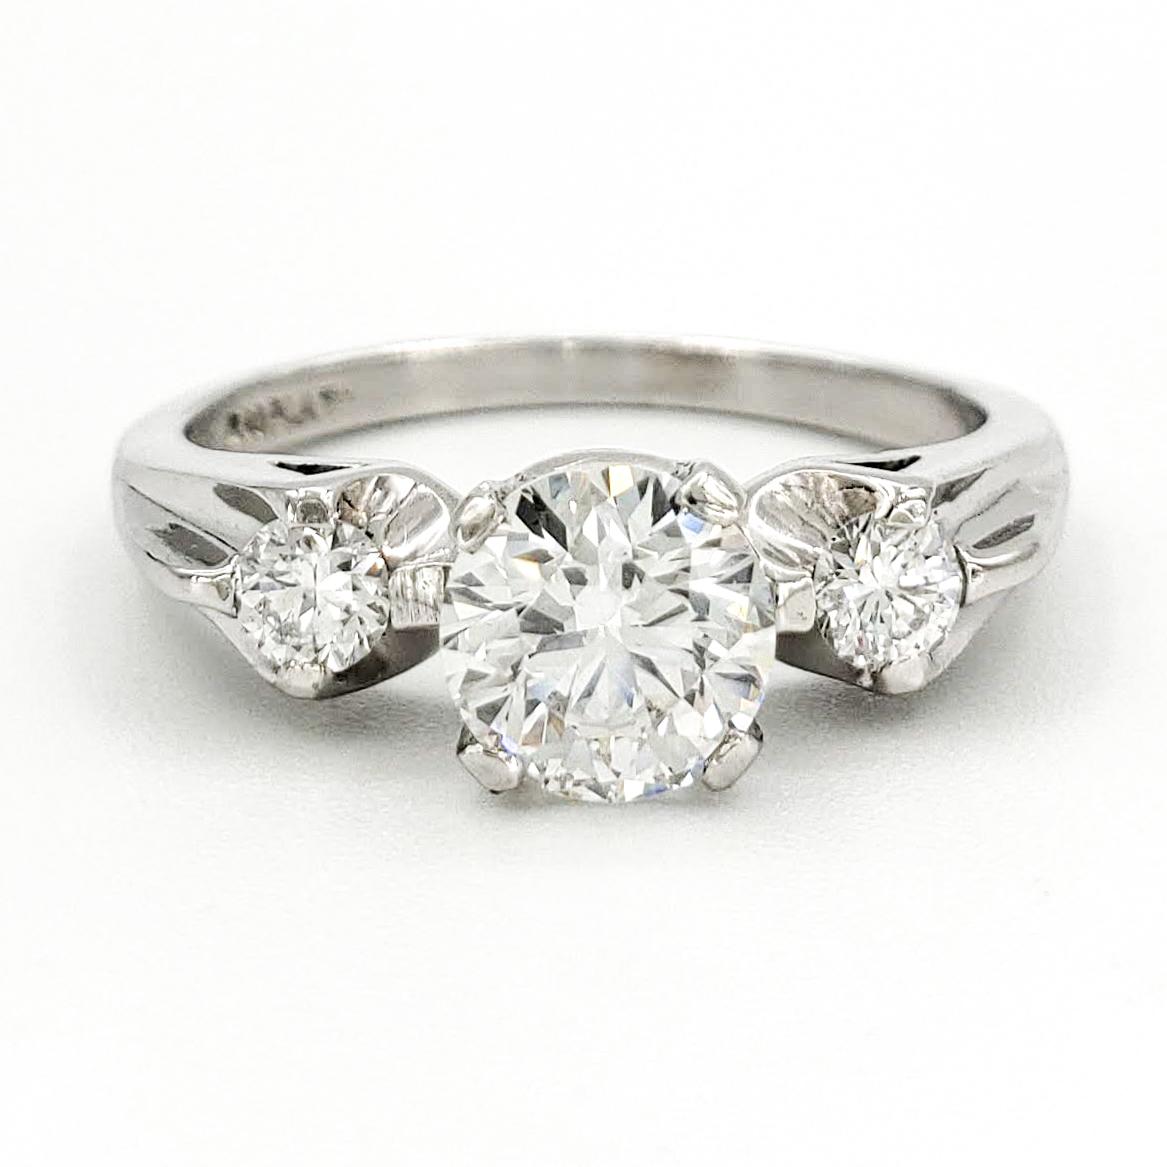 vintage-platinum-engagement-ring-with-0-70-carat-round-brilliant-cut-diamond-gia-g-vs1